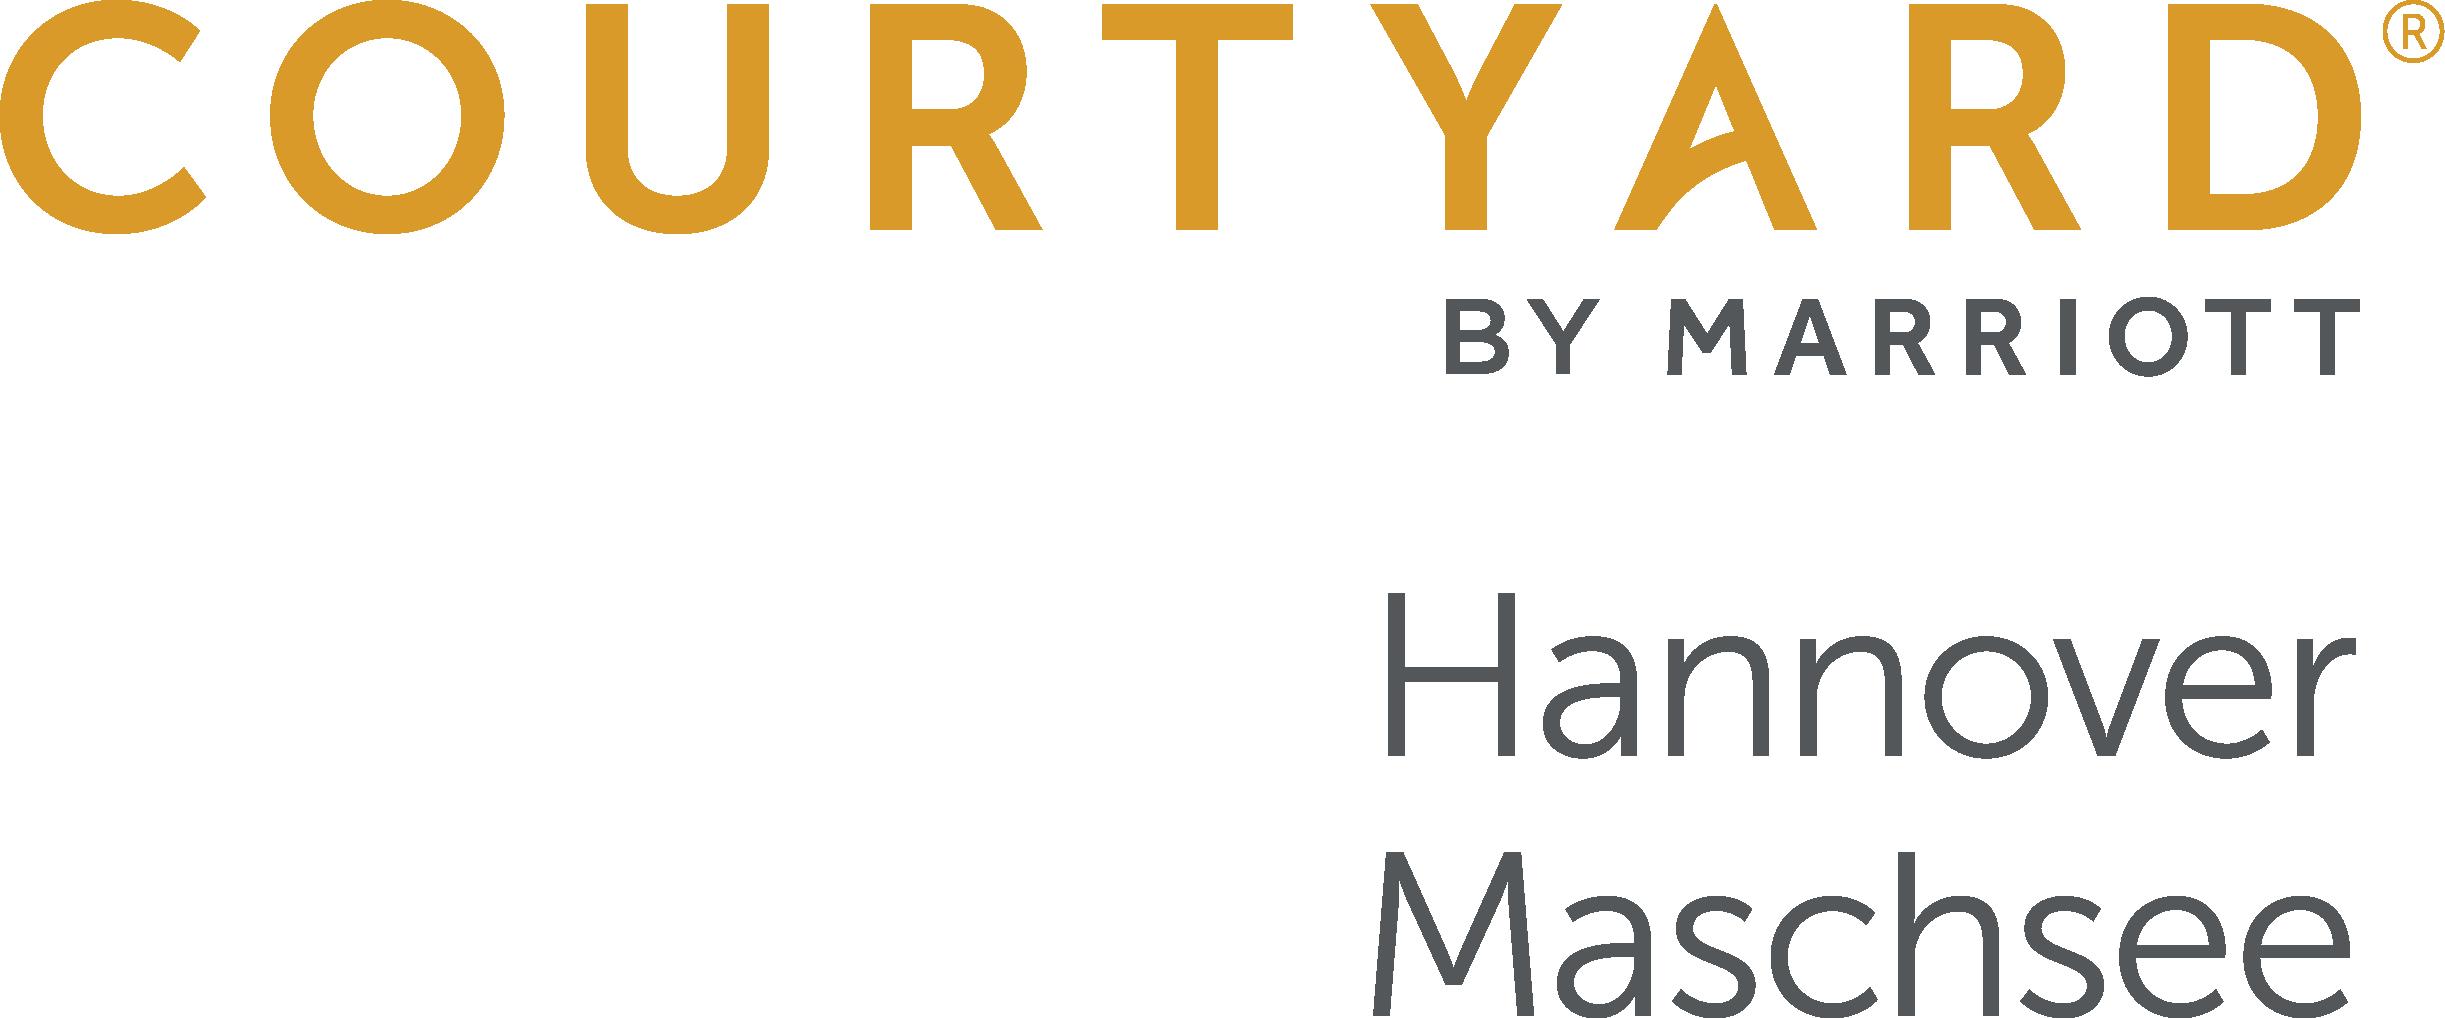 messedaten_messe_220_weblogos_courtyard_by_marriott_hannover_b-b.jpg